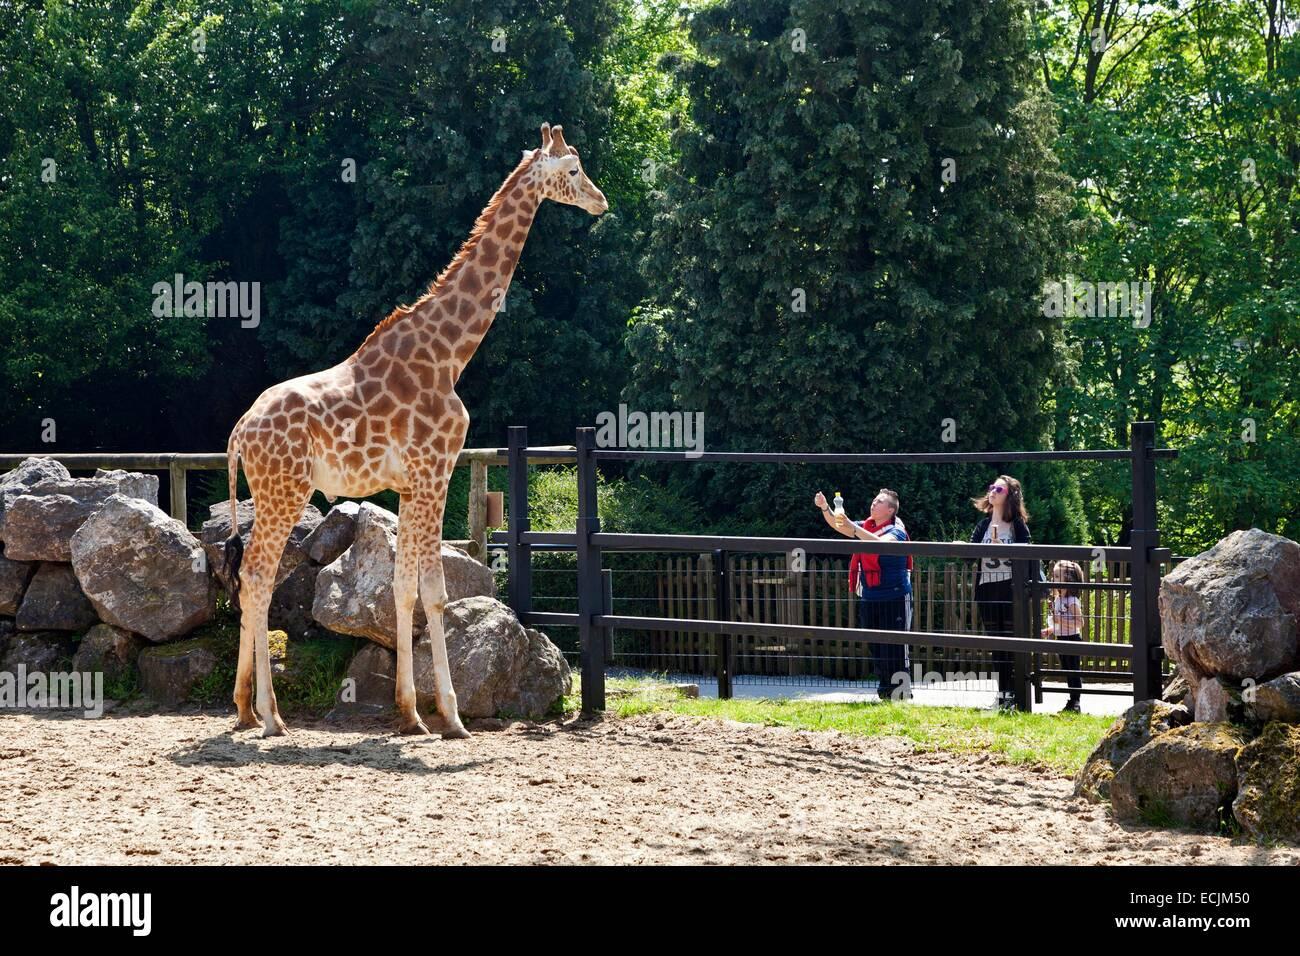 France, Nord, Maubeuge, Maubeuge zoo, visitors watching a Rothschild Giraffe - Stock Image